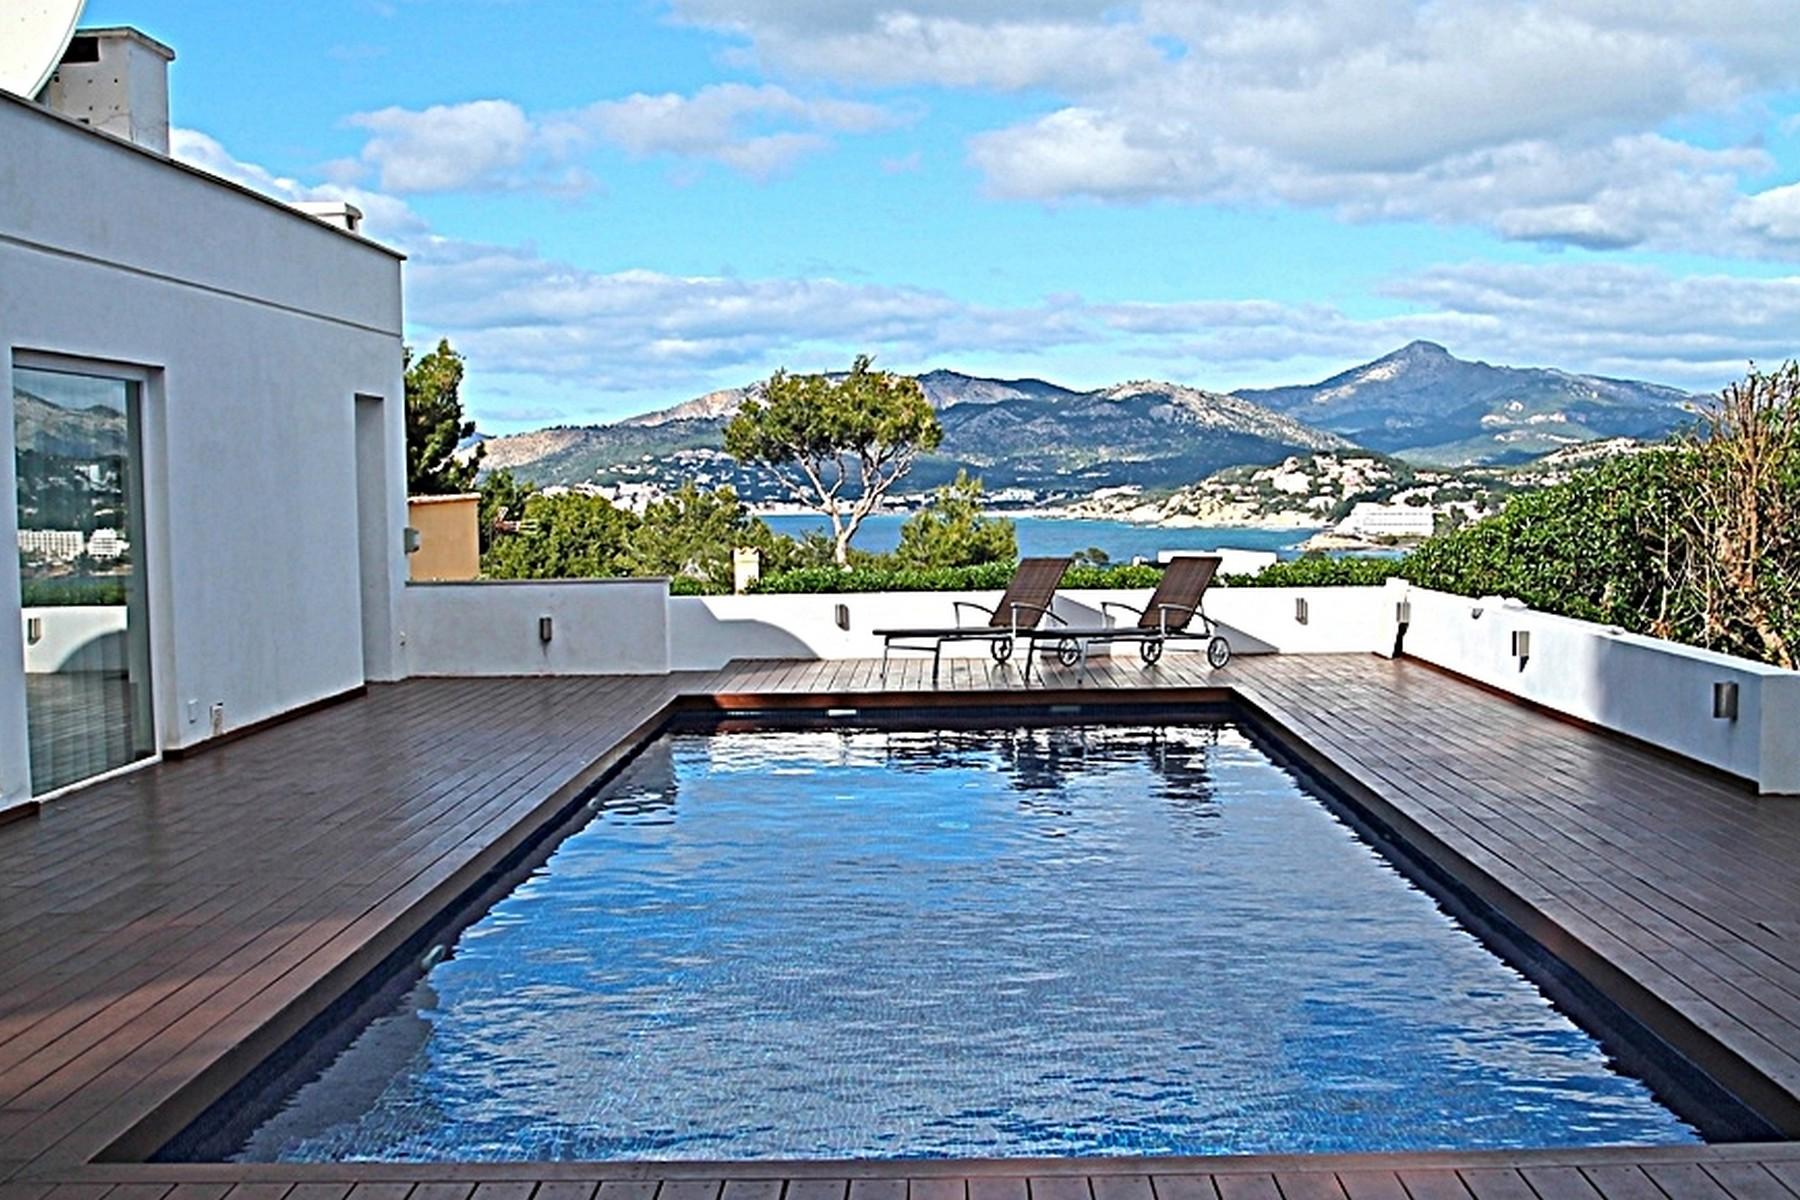 Single Family Home for Sale at Modern villa with magnificent views Nova Santa Ponsa, Mallorca, 07180 Spain